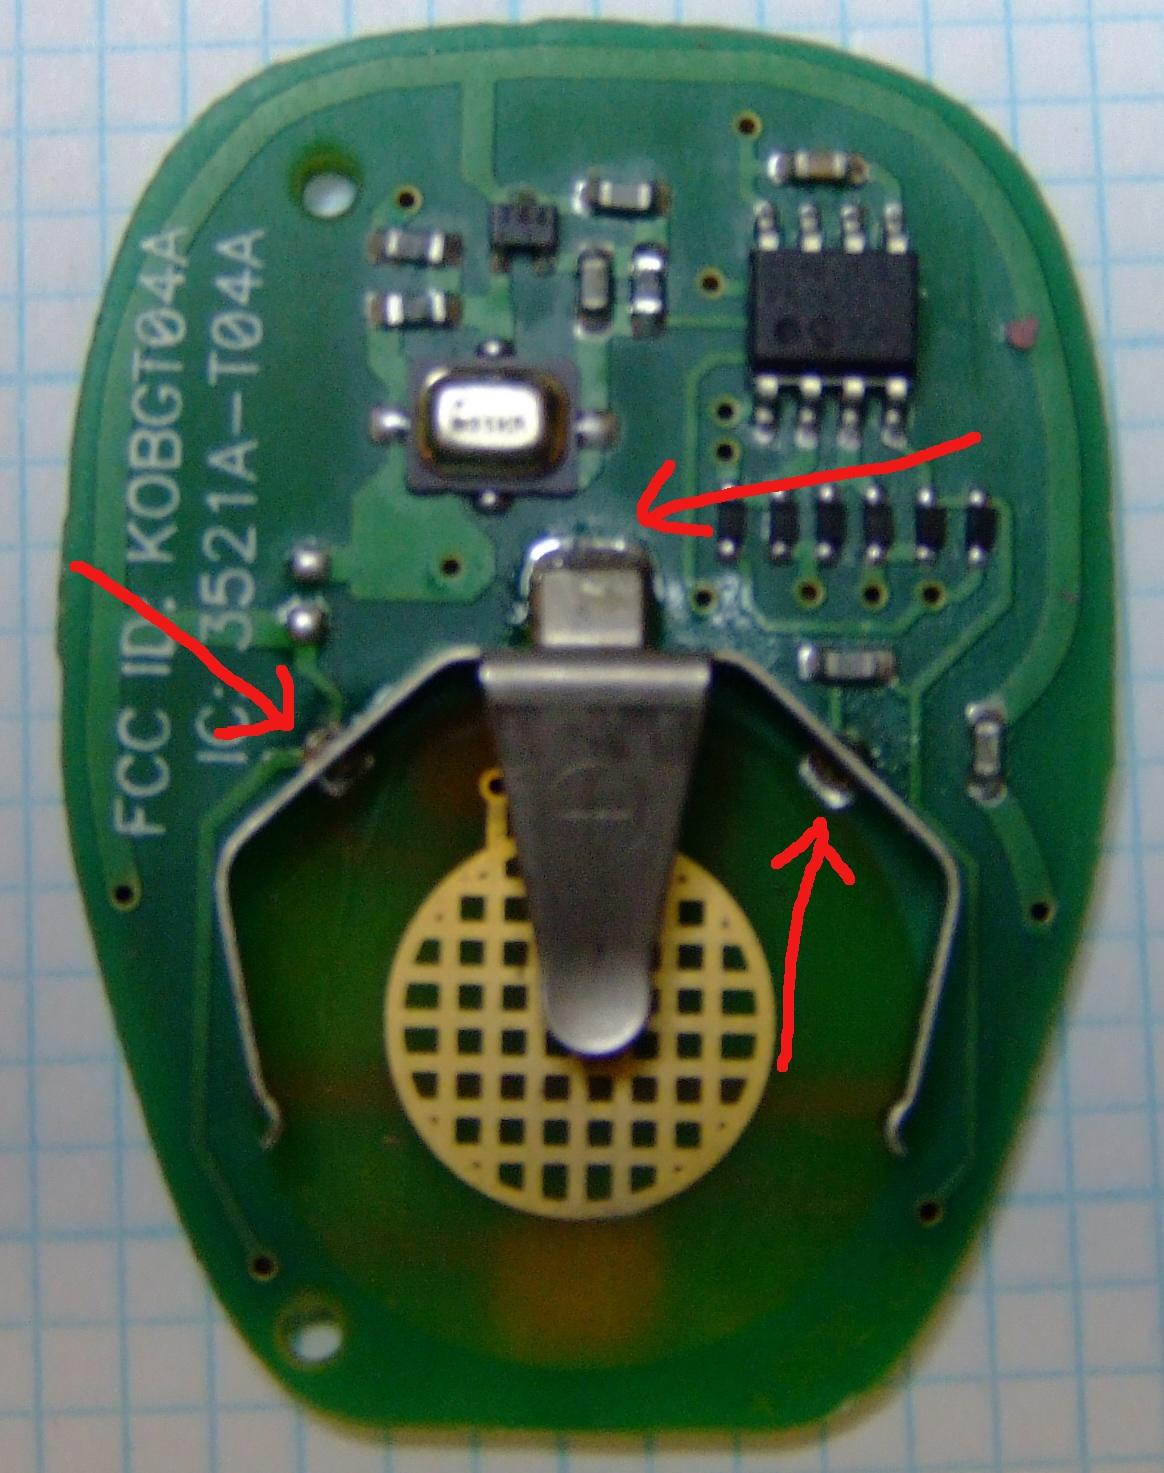 hight resolution of key fob schematic wiring diagram technic fixyourboard chevy keyfob key fob schematic